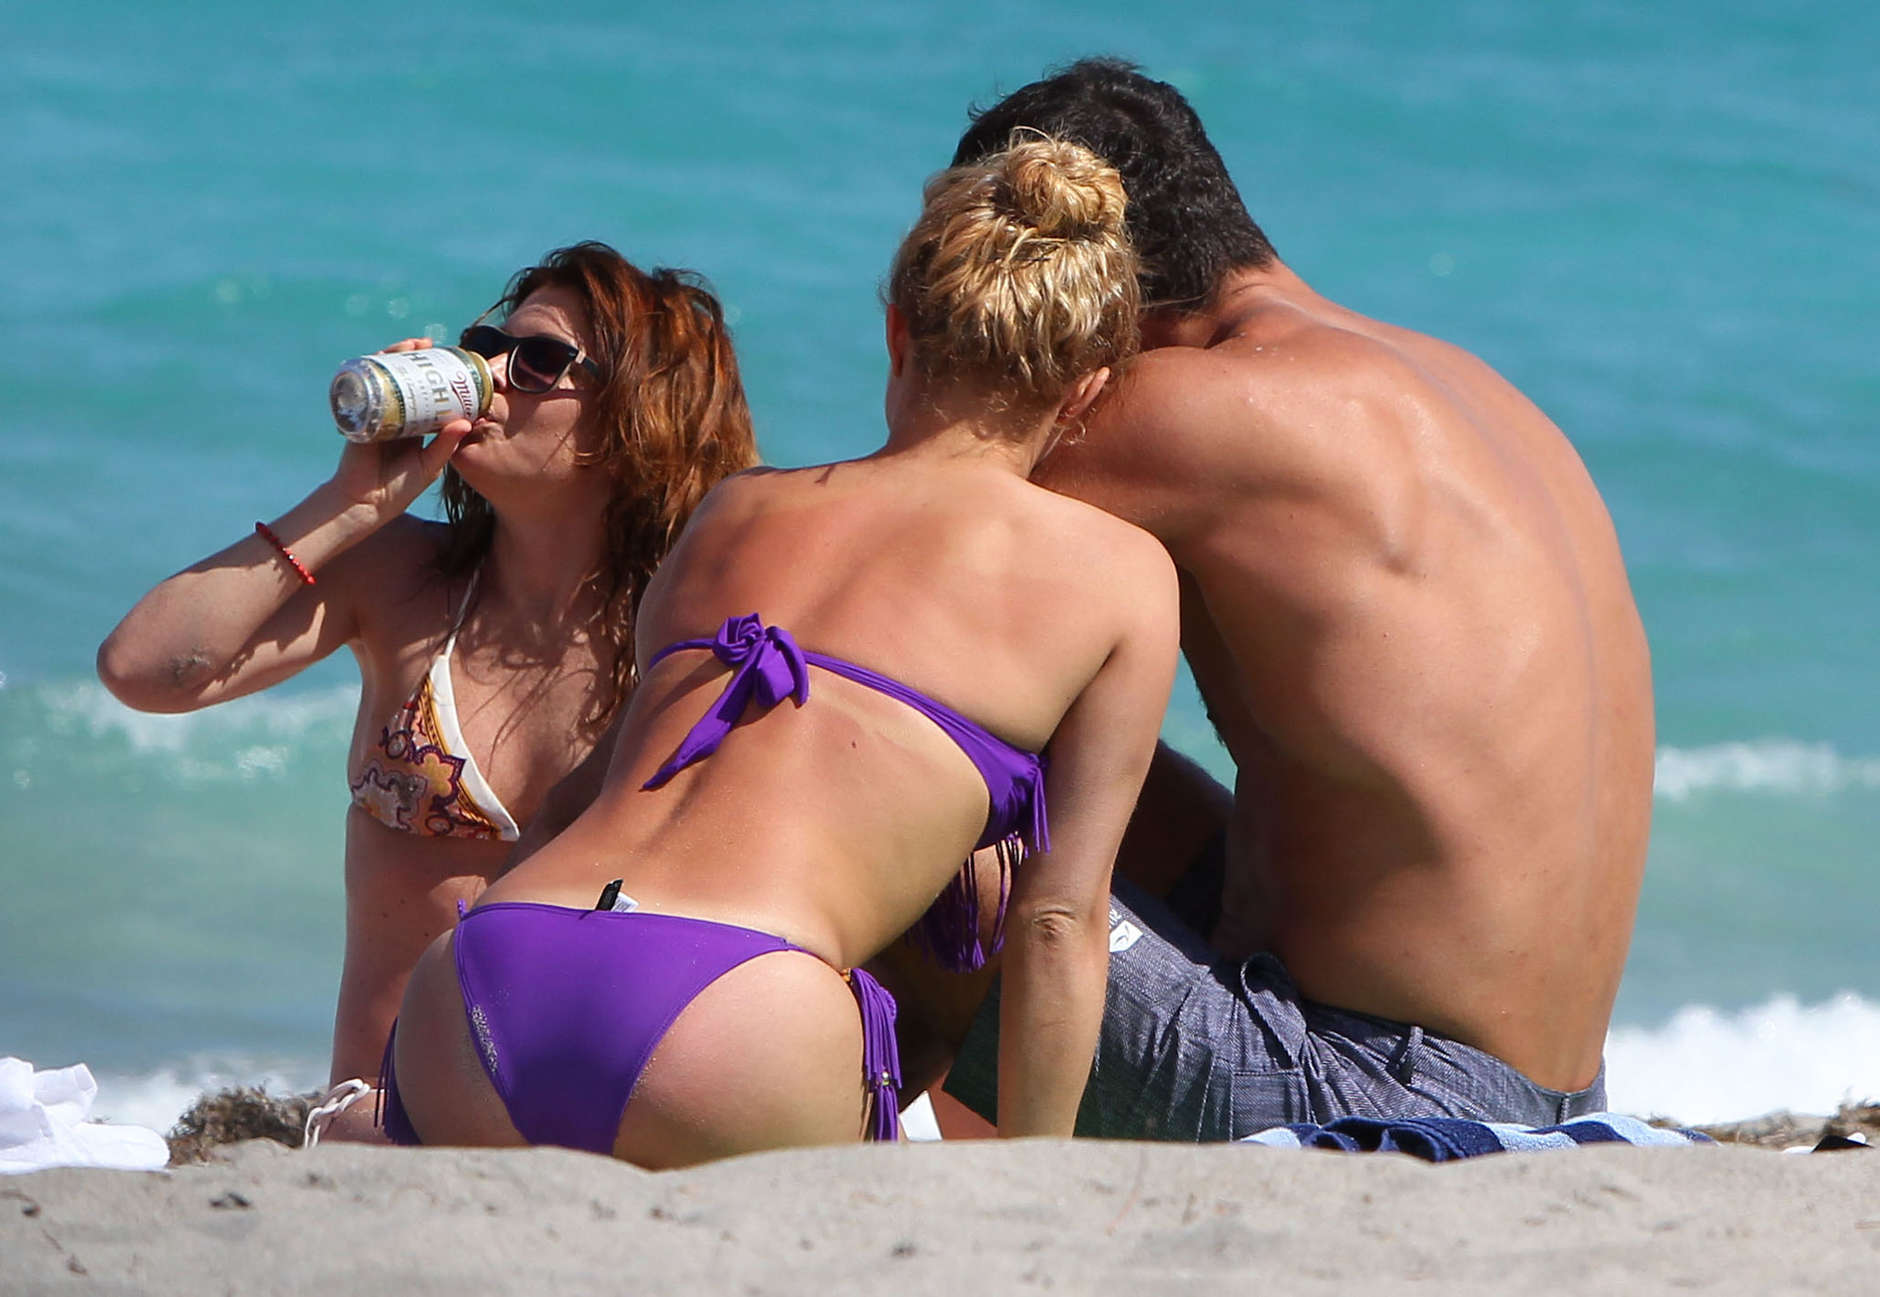 Hayden Panettiere - Bikini in Miami (April 2013 HQ Adds)-08 - GotCeleb Hayden Panettiere